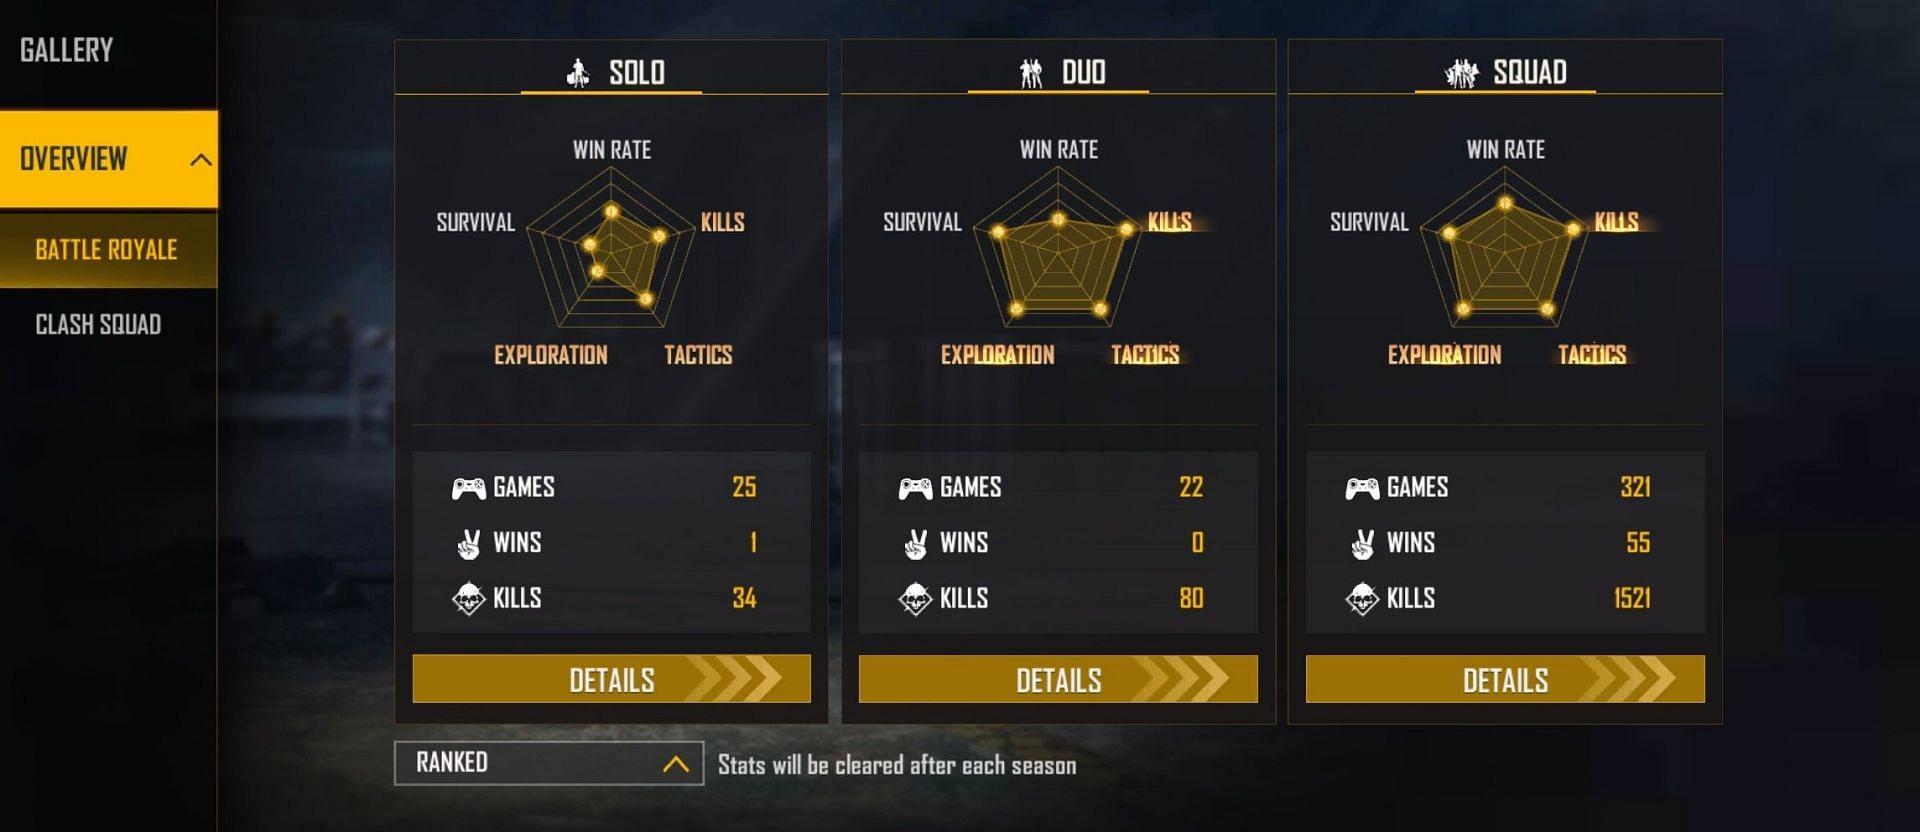 Ajjubhai has not won any duo games (Image via Free Fire)